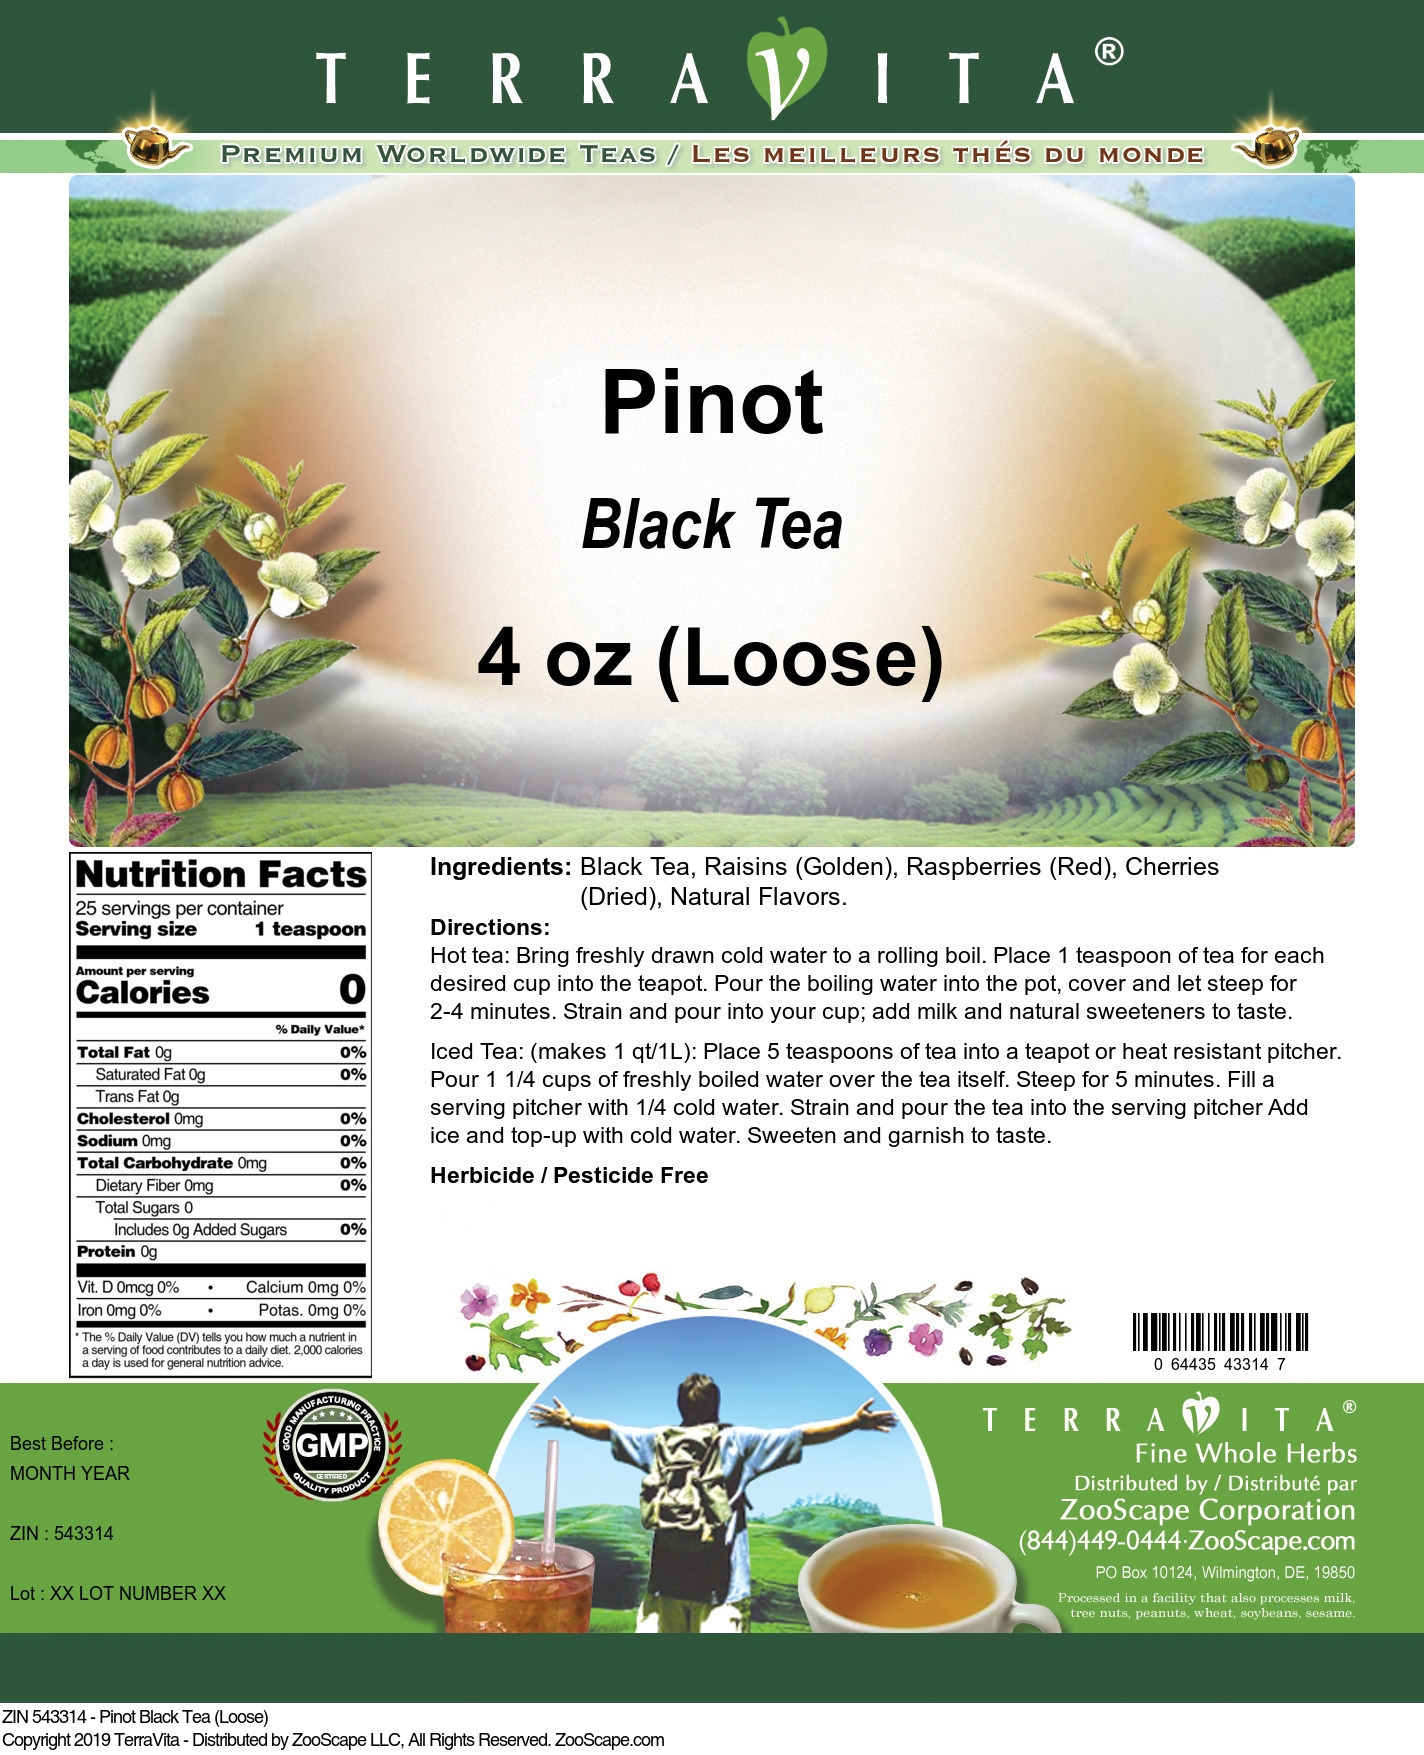 Pinot Black Tea (Loose)